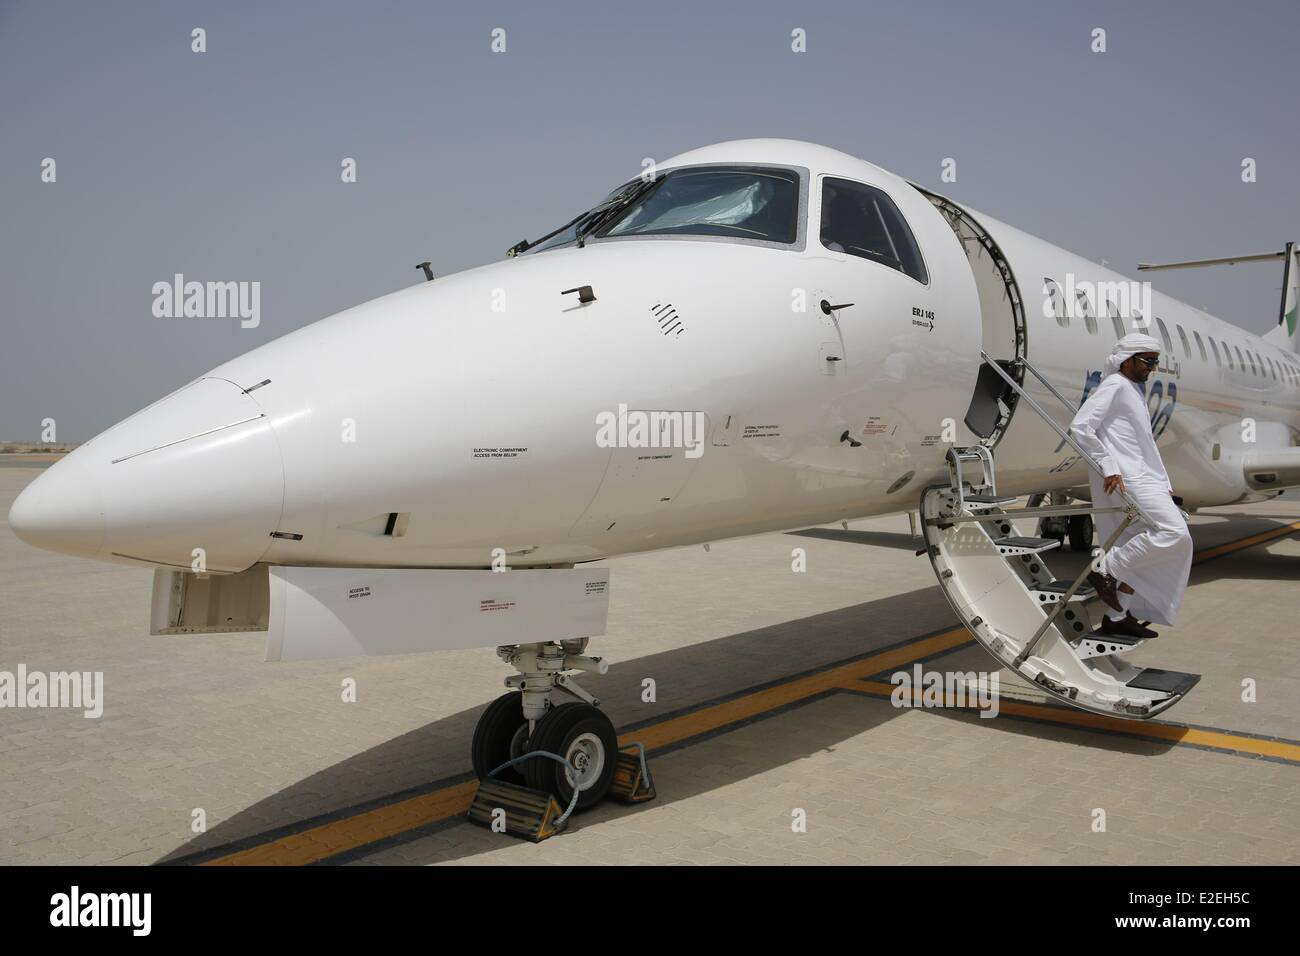 United Arab Emirates, Abu Dhabi, Sir Bani Yas island, ahmad Bin Ahmad private jet - Stock Image